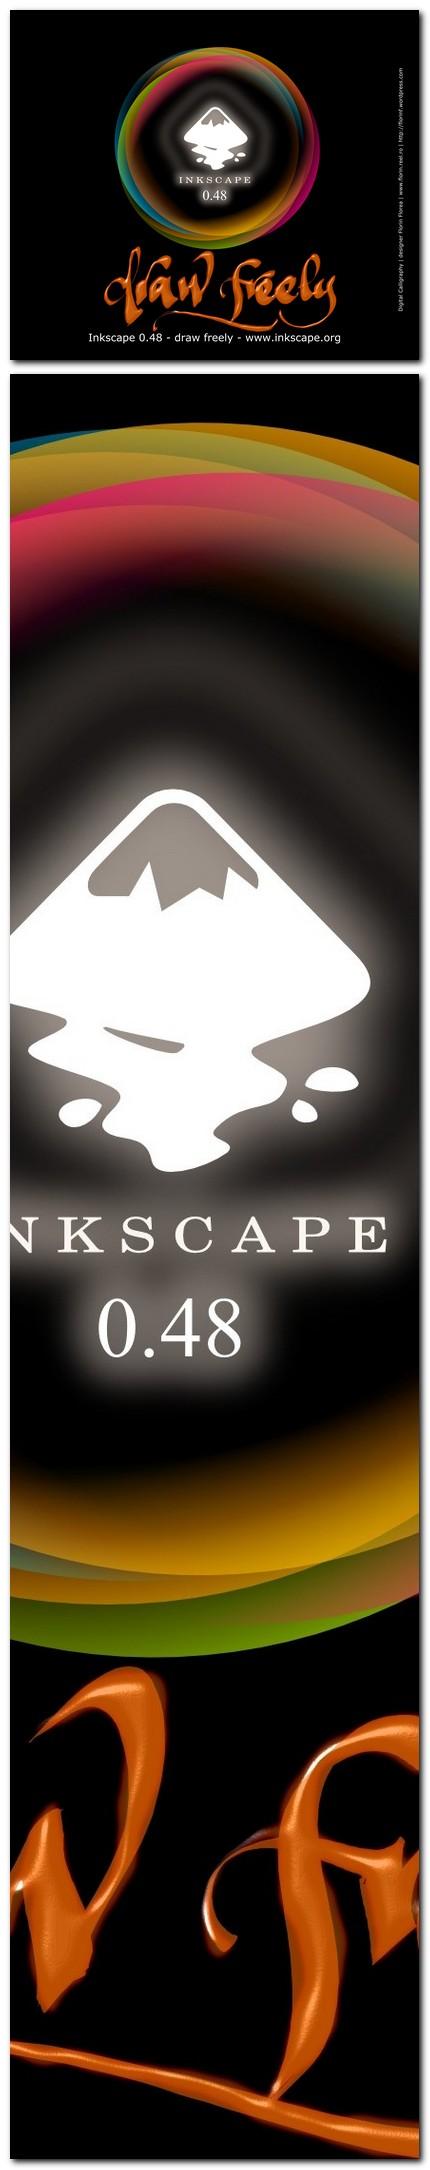 "03 ecran ""About Inkscape"" varianta netrimisa - florinf"